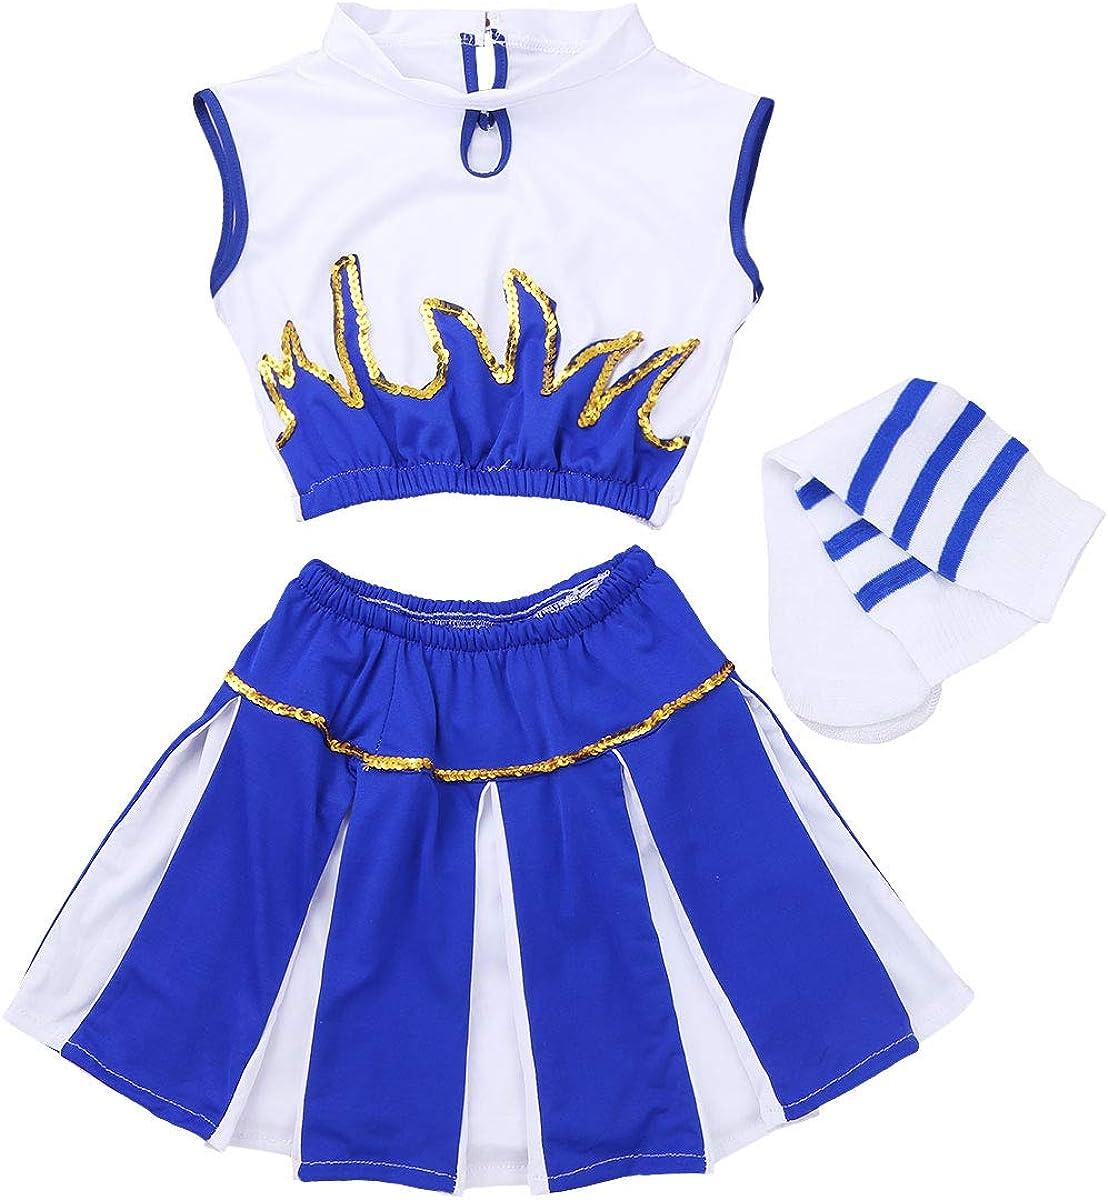 vastwit Kids Girls' sale 3Pcs Sequined outlet Crop Top wit Skirt Shorts Tank